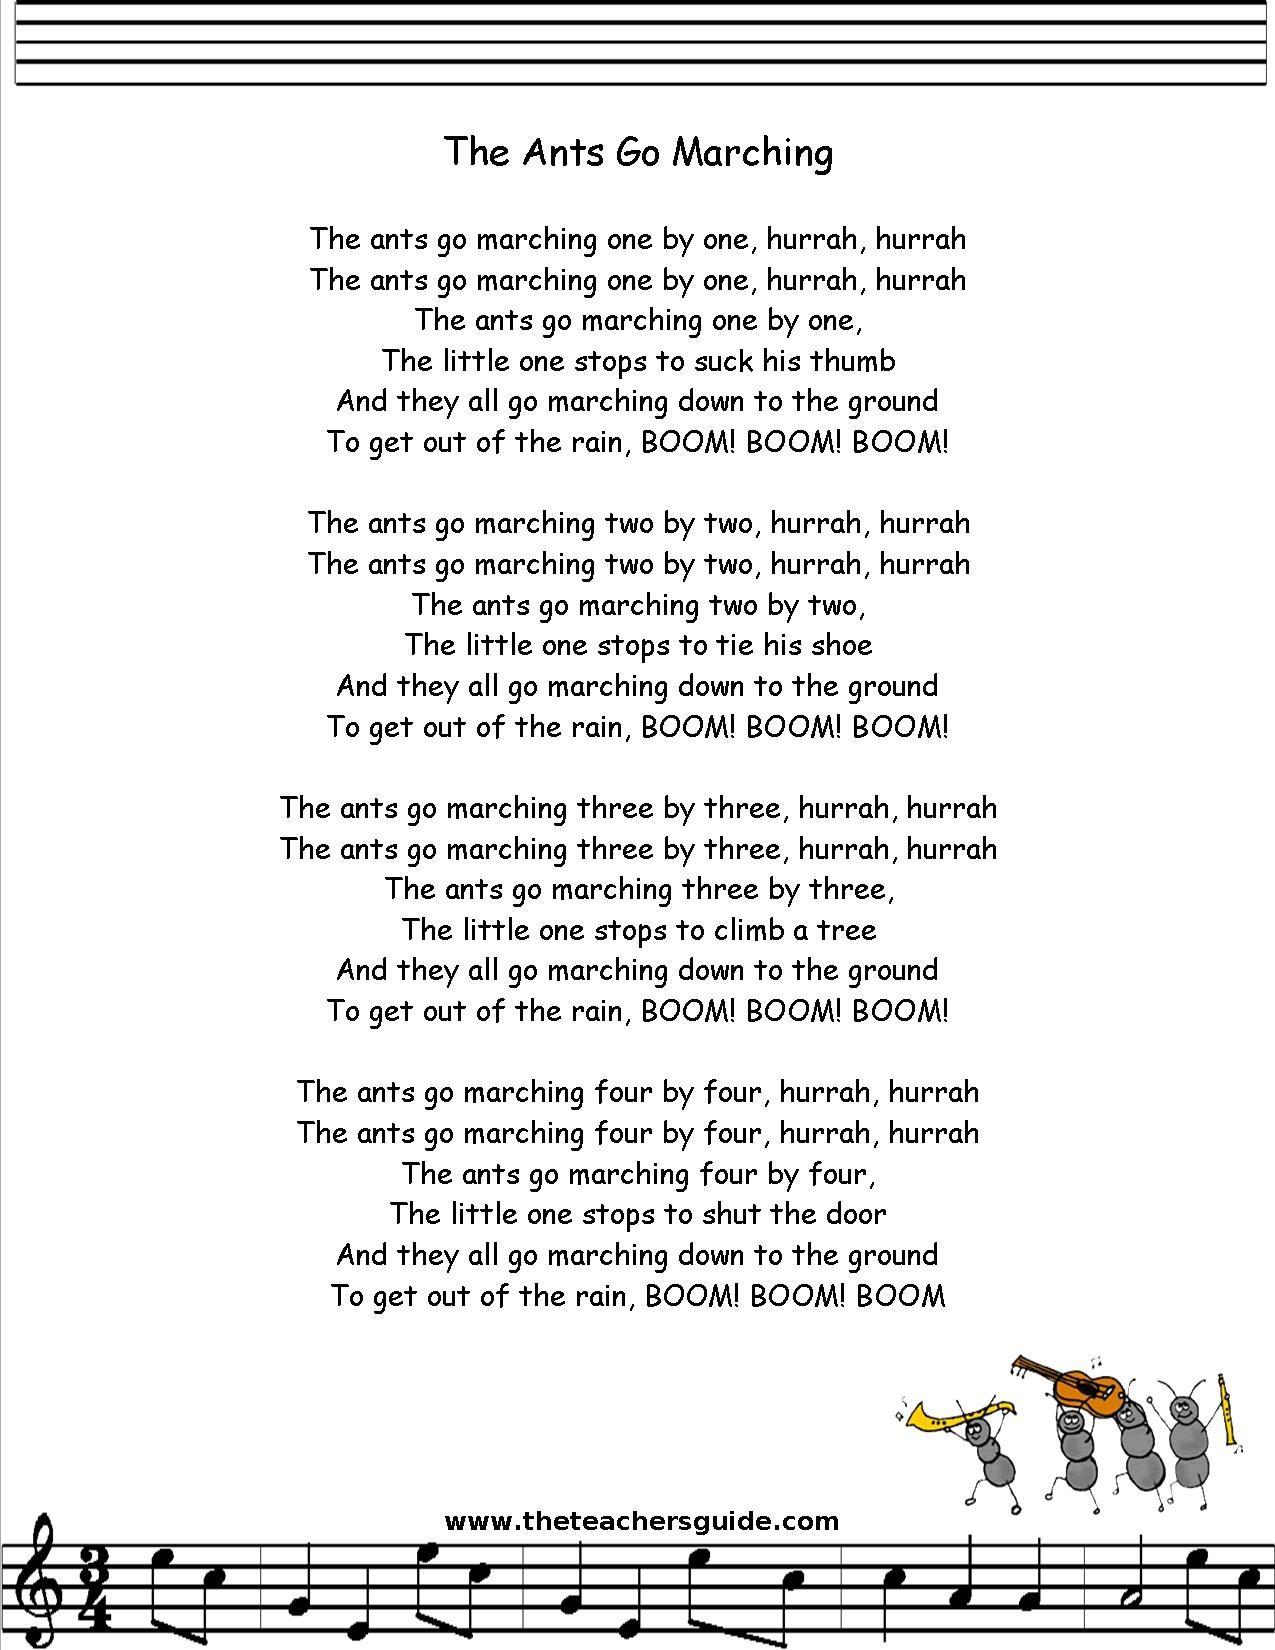 Ants Go Marching Lyrics Printout